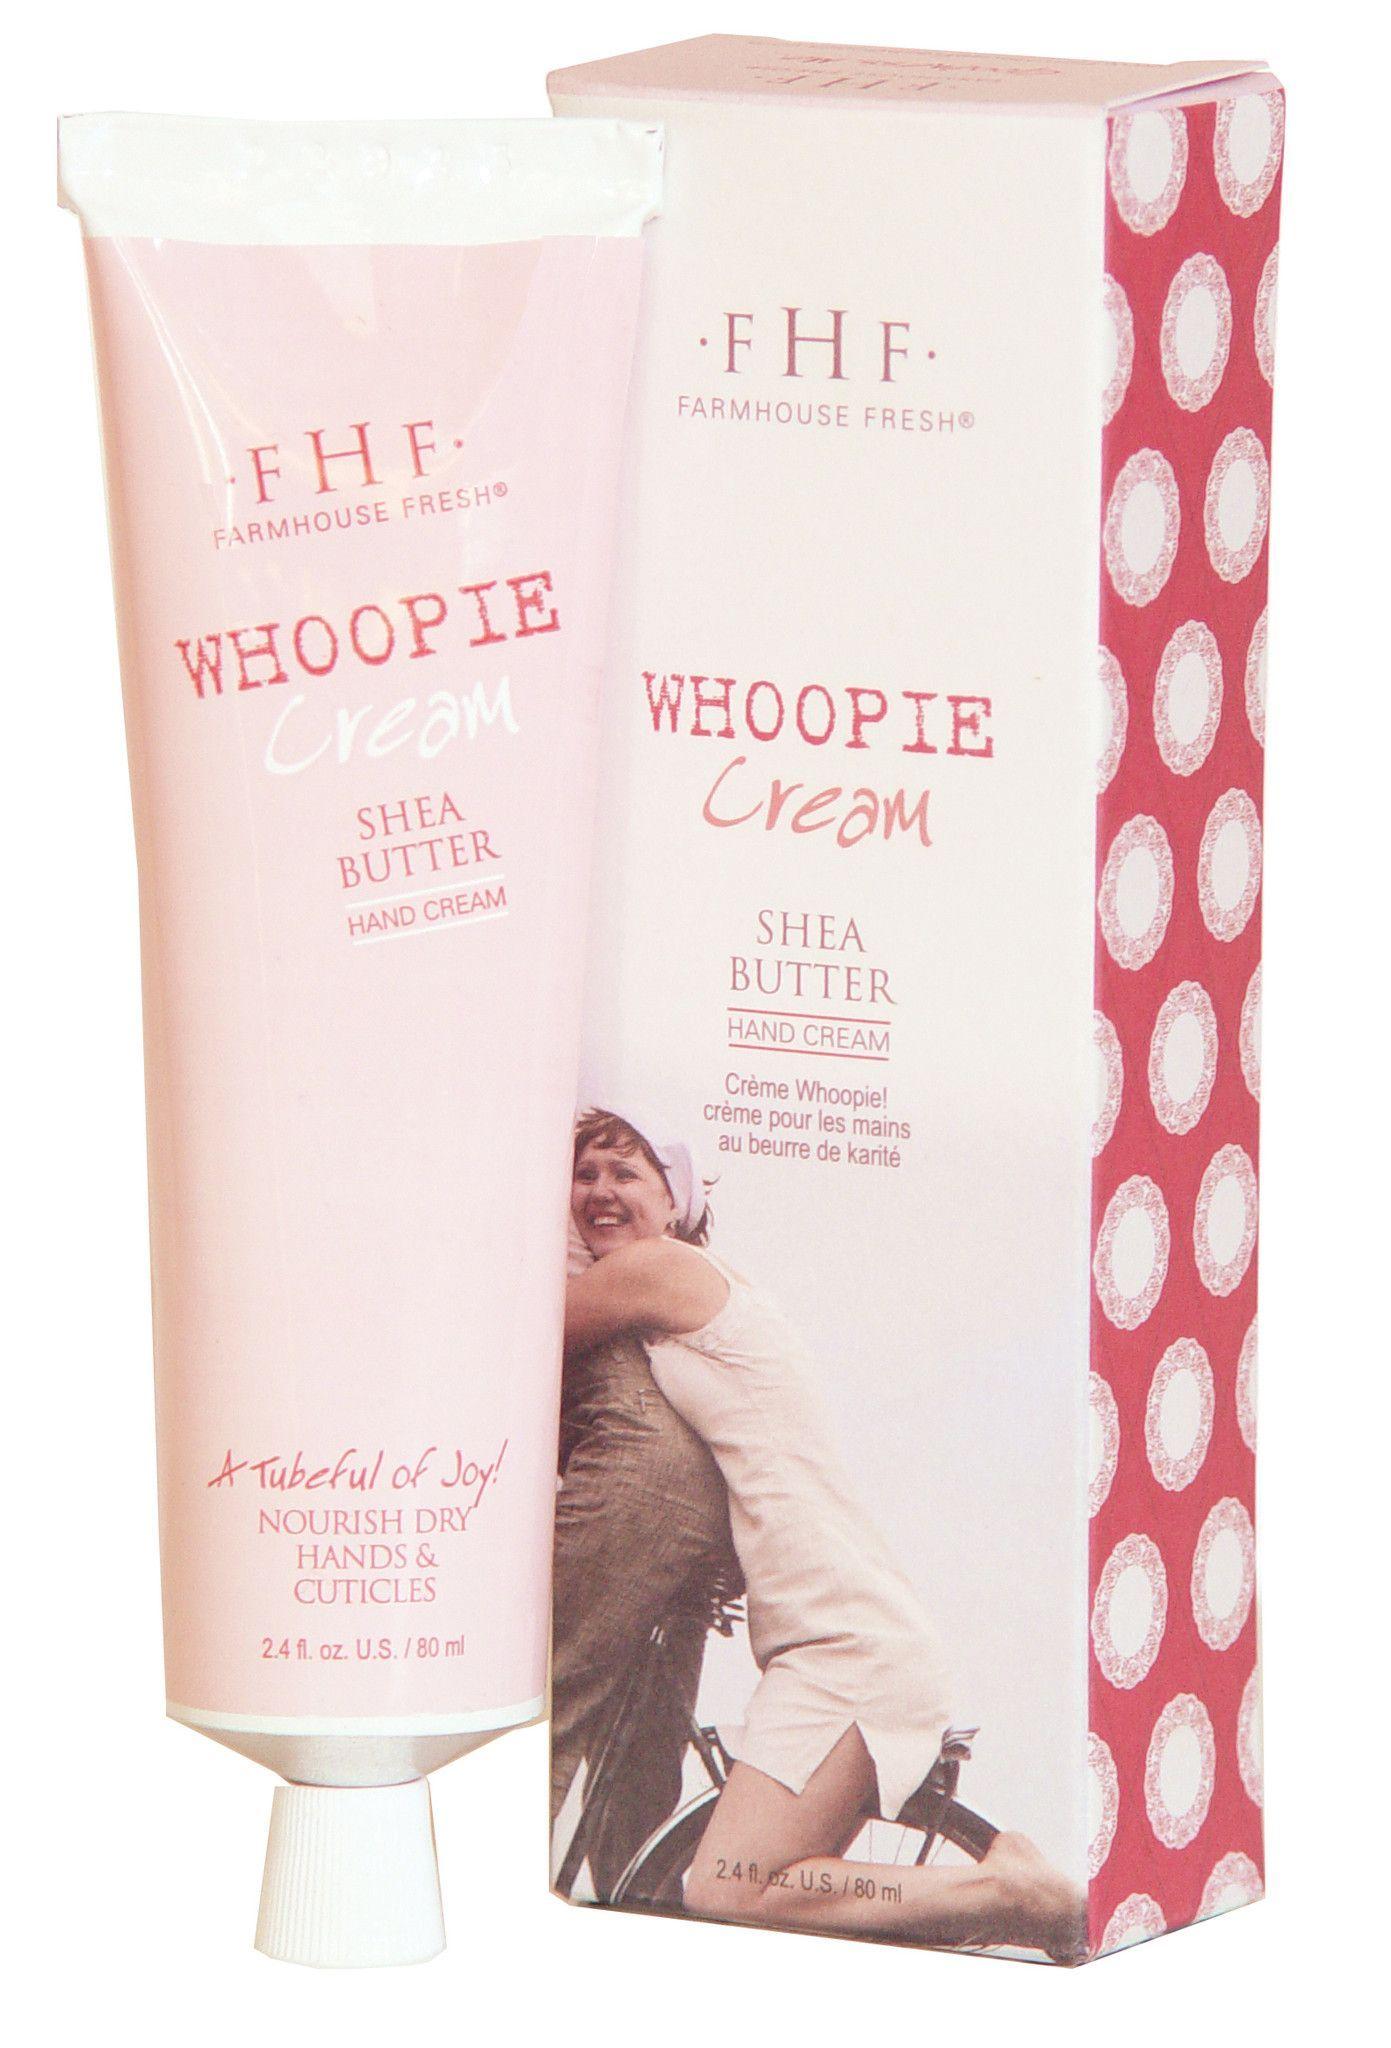 Farmhouse Fresh Whoopie! Shea Butter Hand Cream Shea